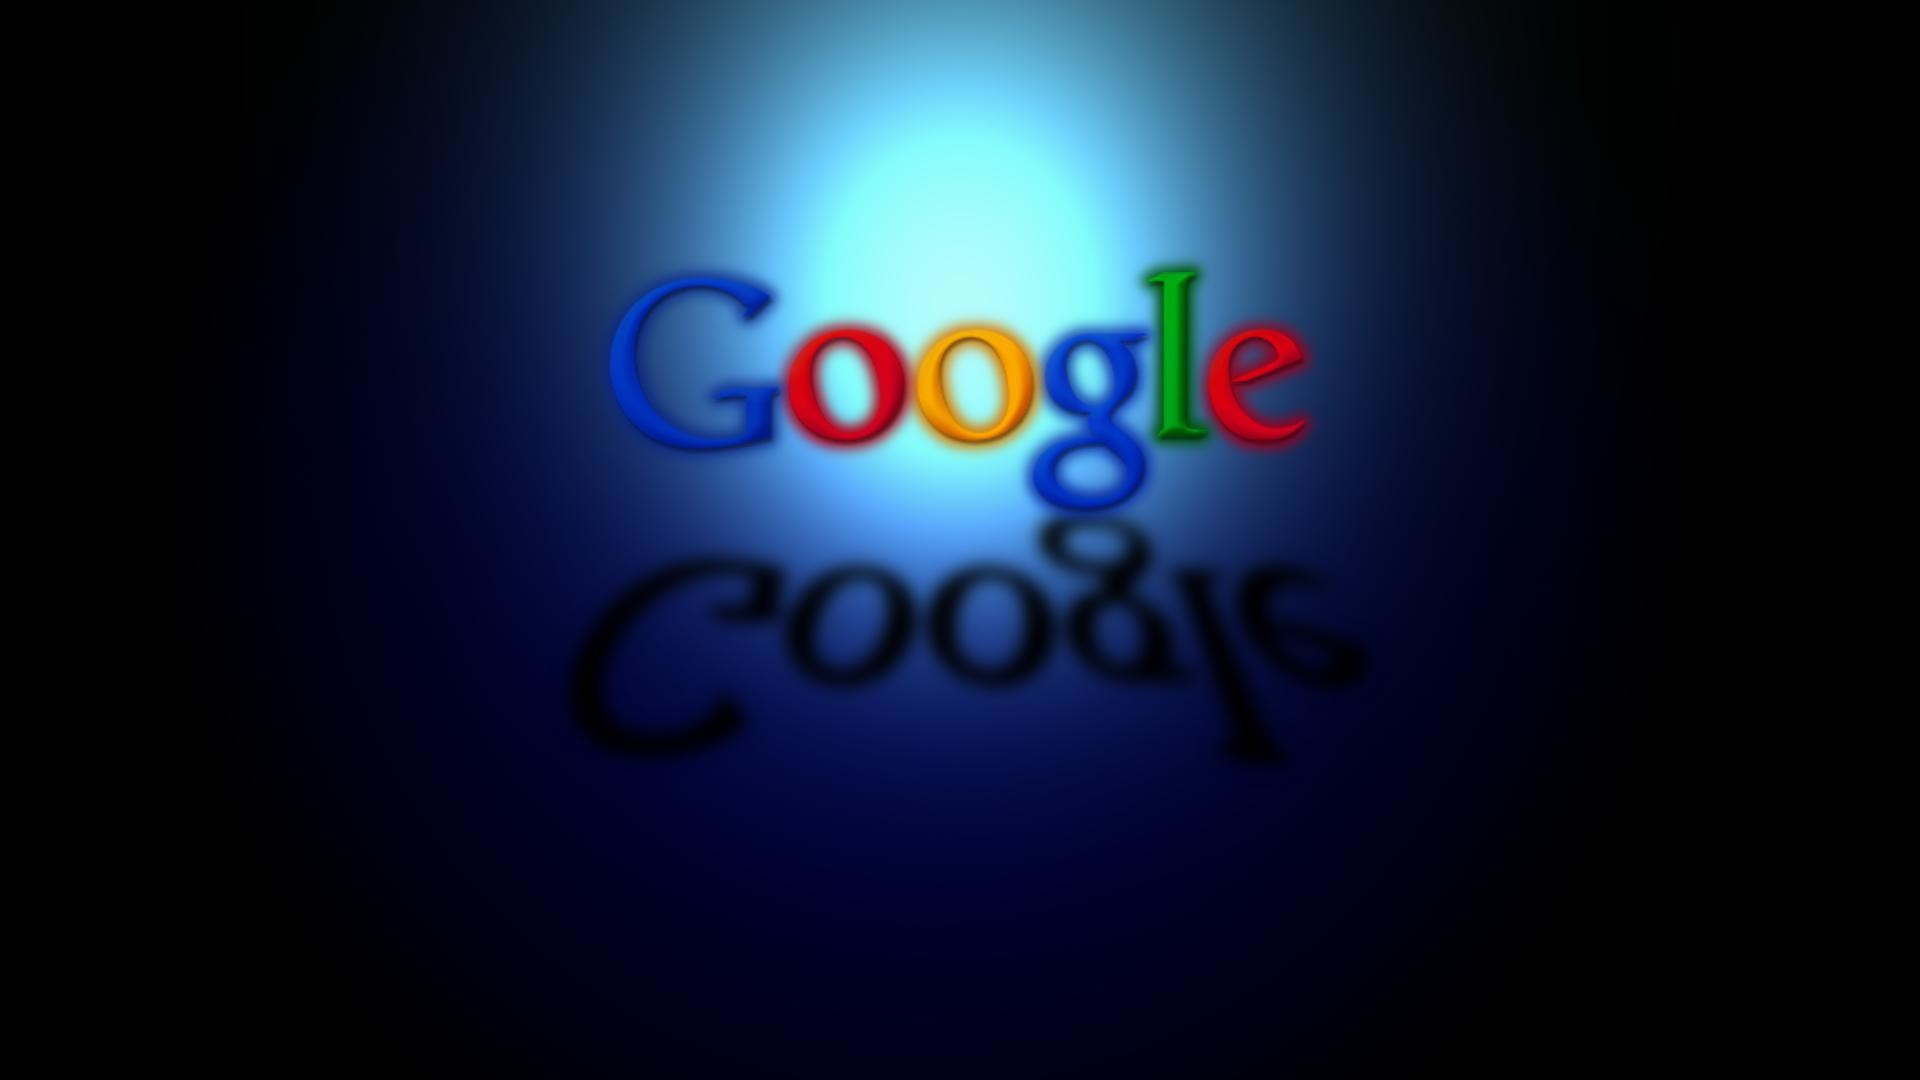 Google Homepage Wallpaper (63+ images)